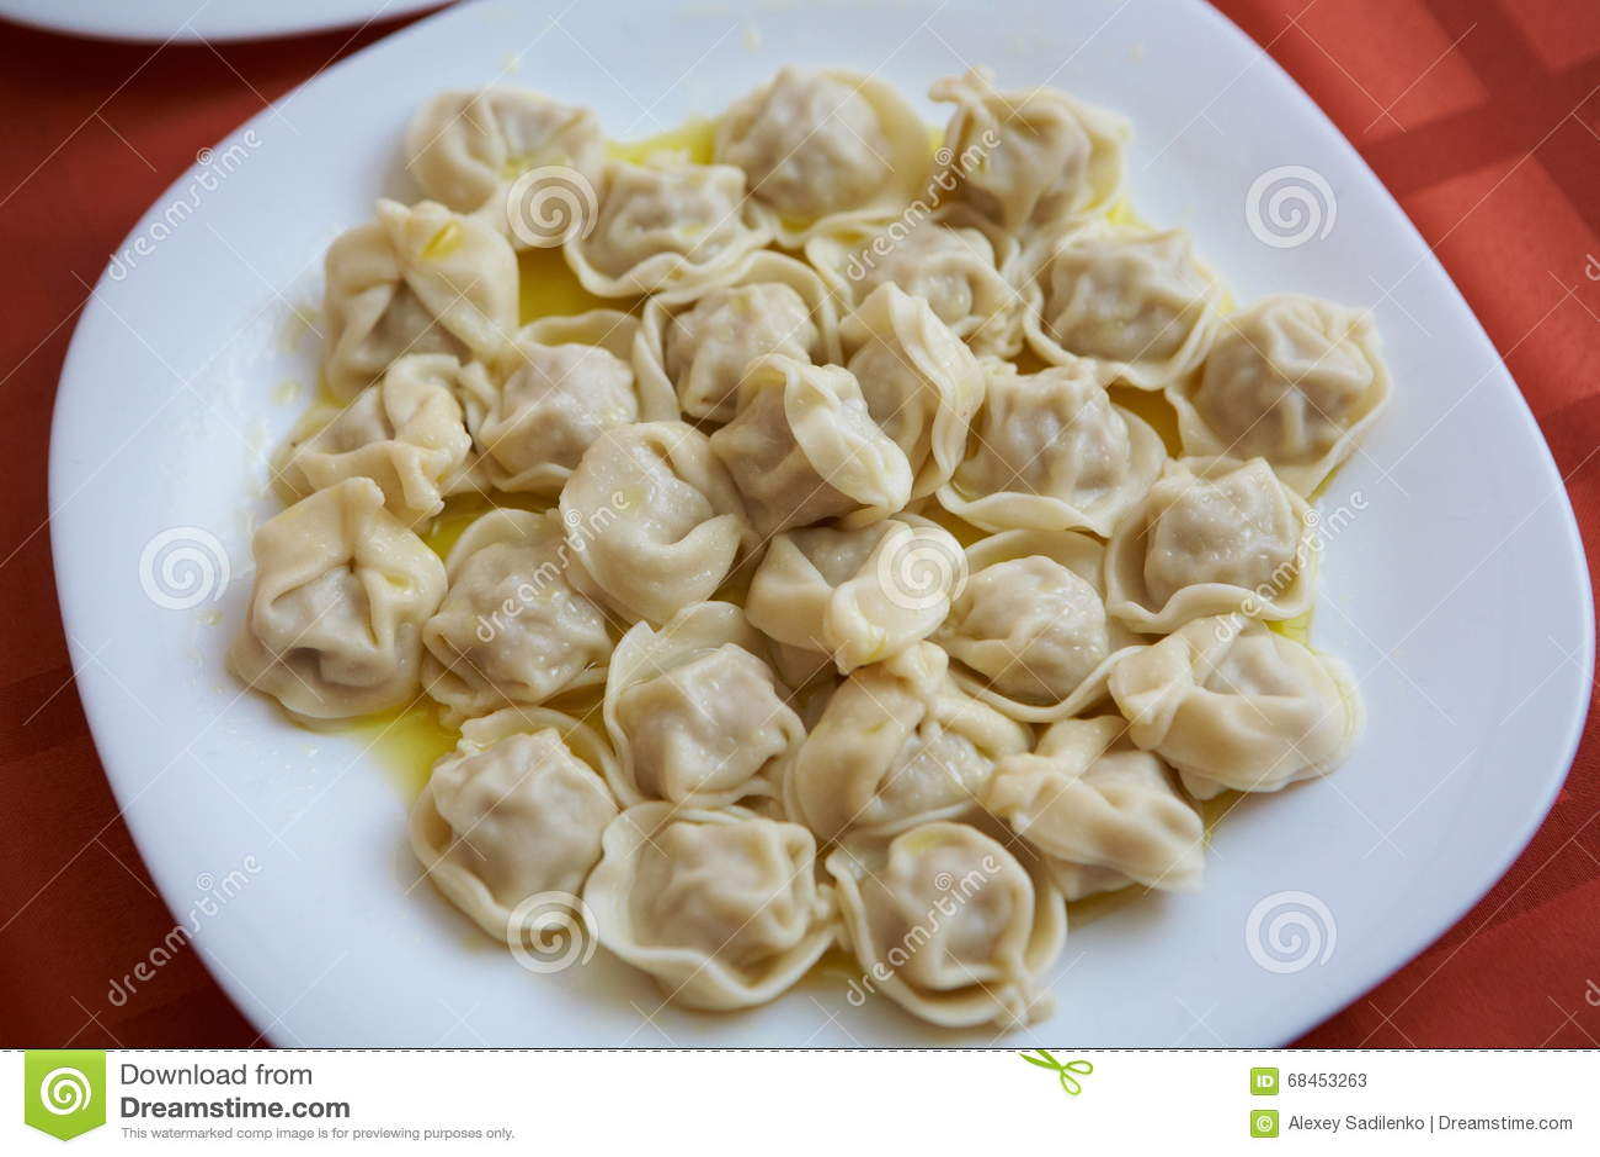 Siberian dumplings (Siberian collection): reviews and expert opinion 49